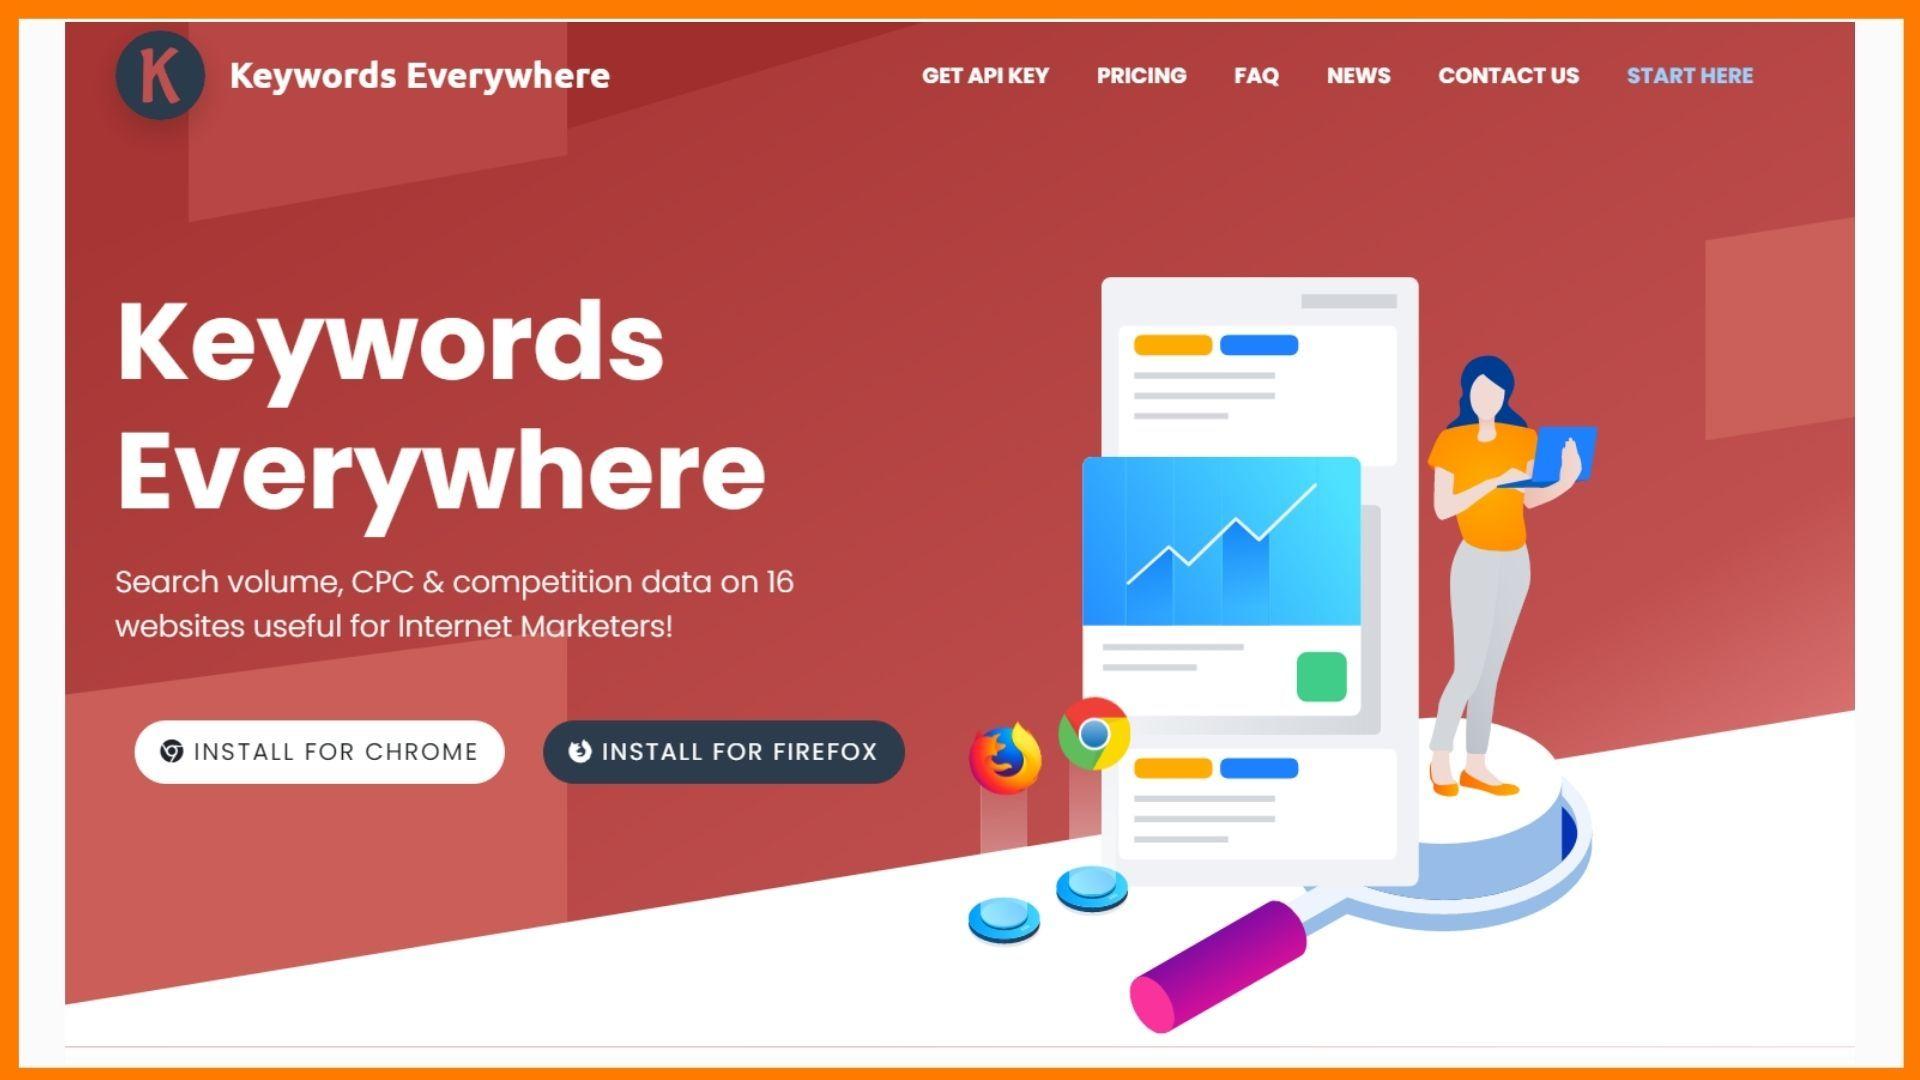 Keywords Everywhere: SEO Keyword Tool